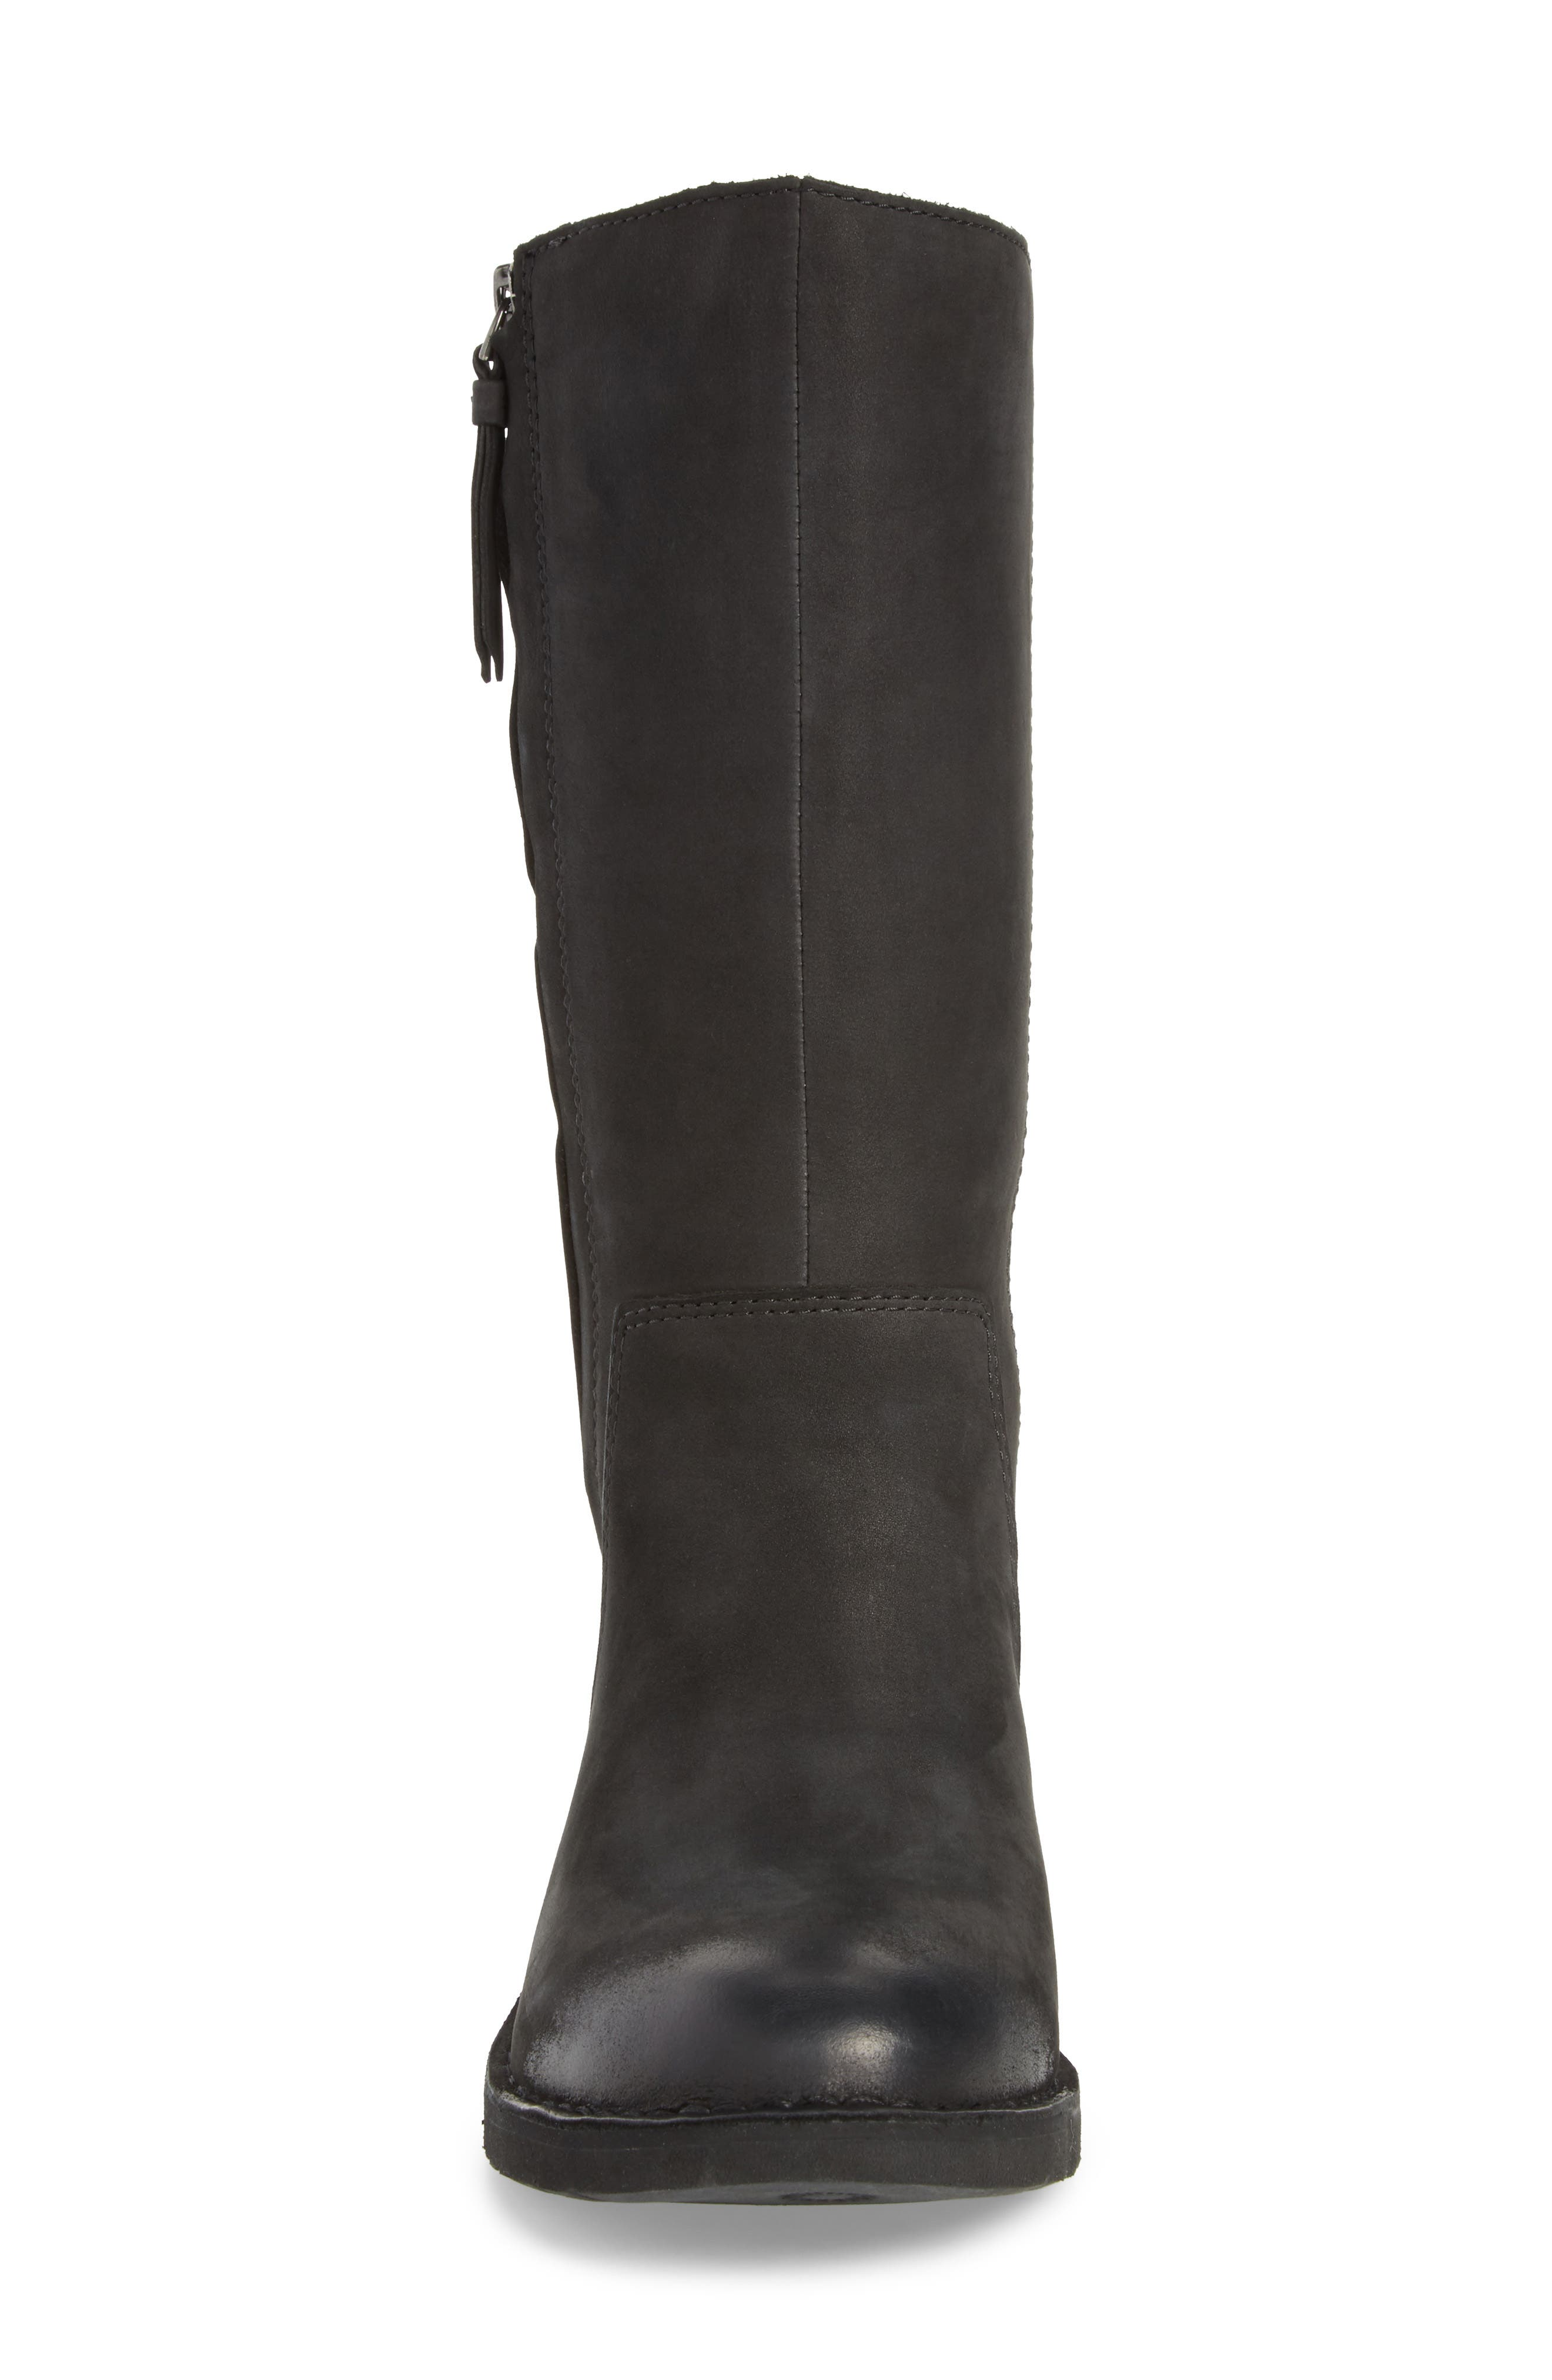 Elly Boot,                             Alternate thumbnail 4, color,                             Black Nubuck Leather